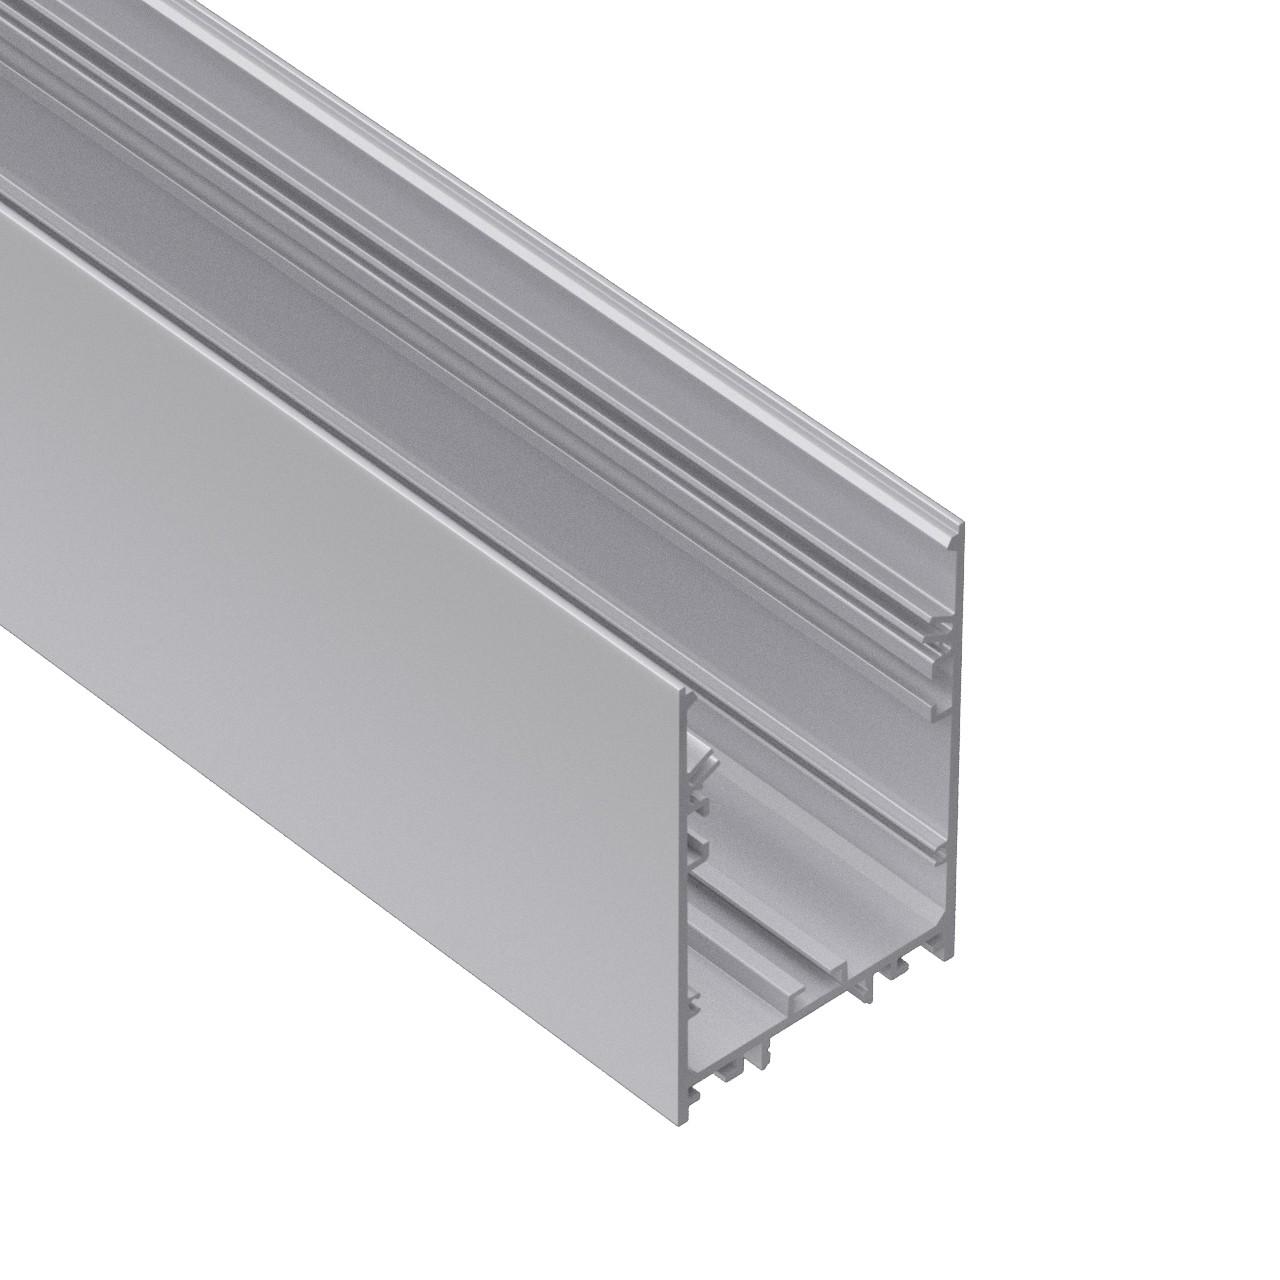 P60 Led Aluminium-Profil